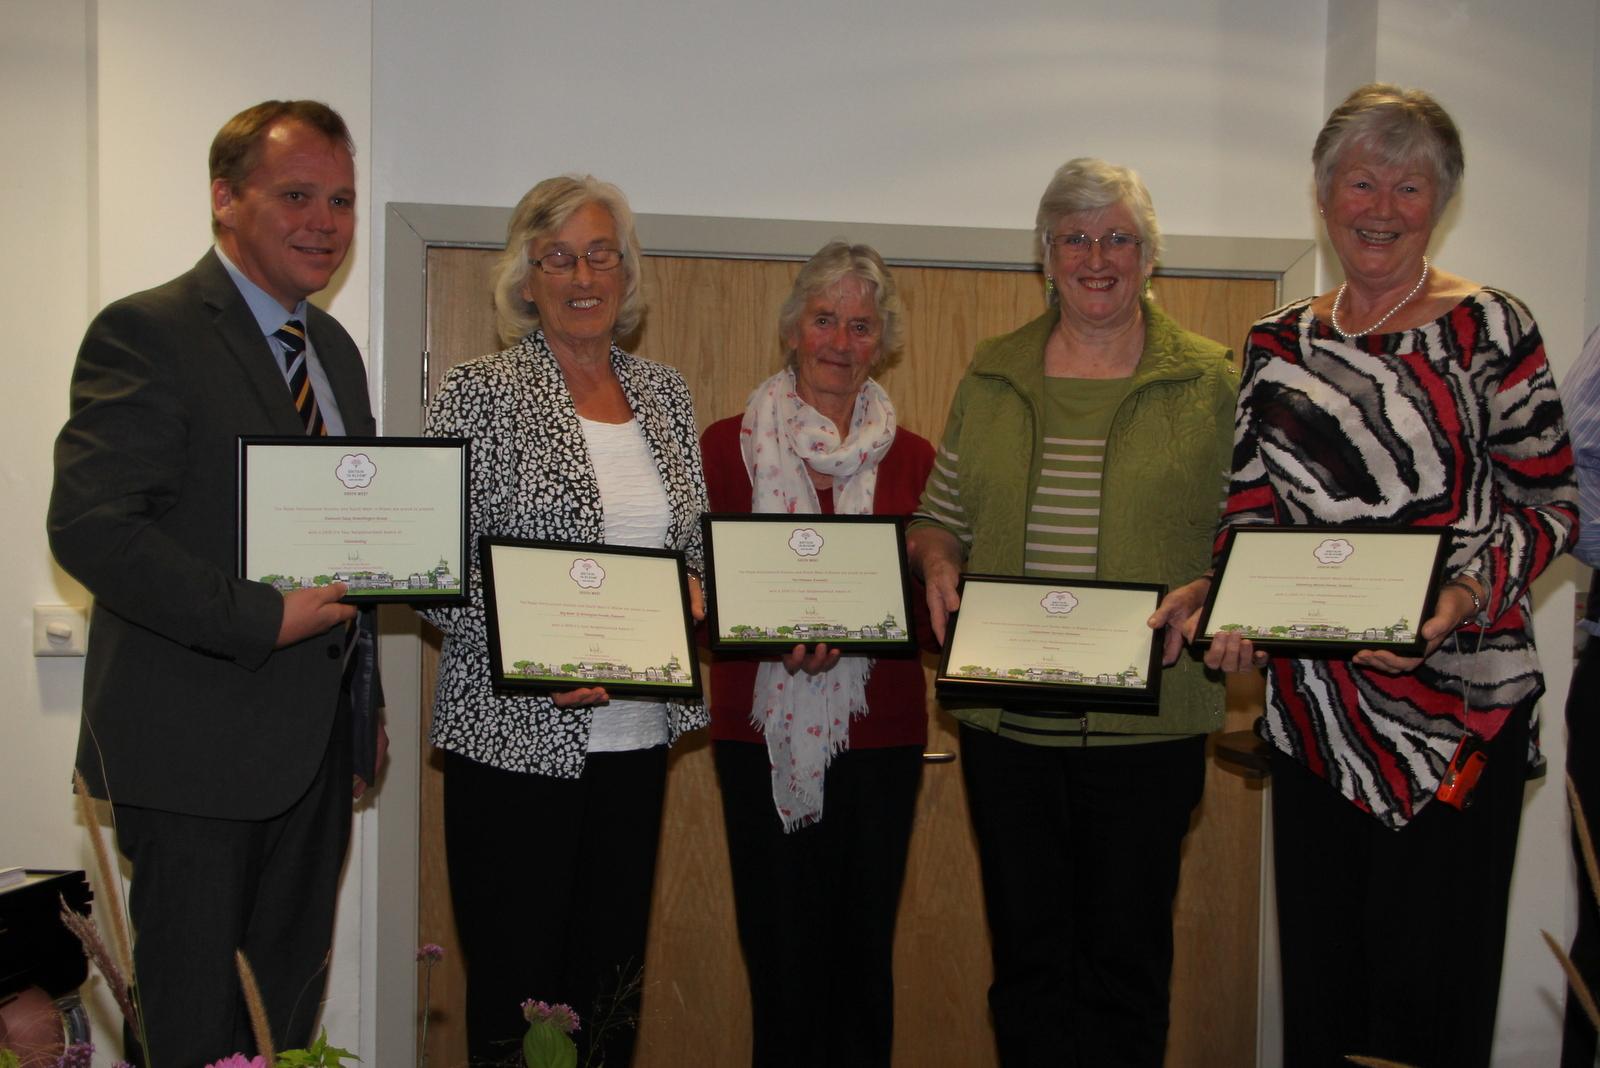 Receiving Neighbourhood awards from Terry Doyle